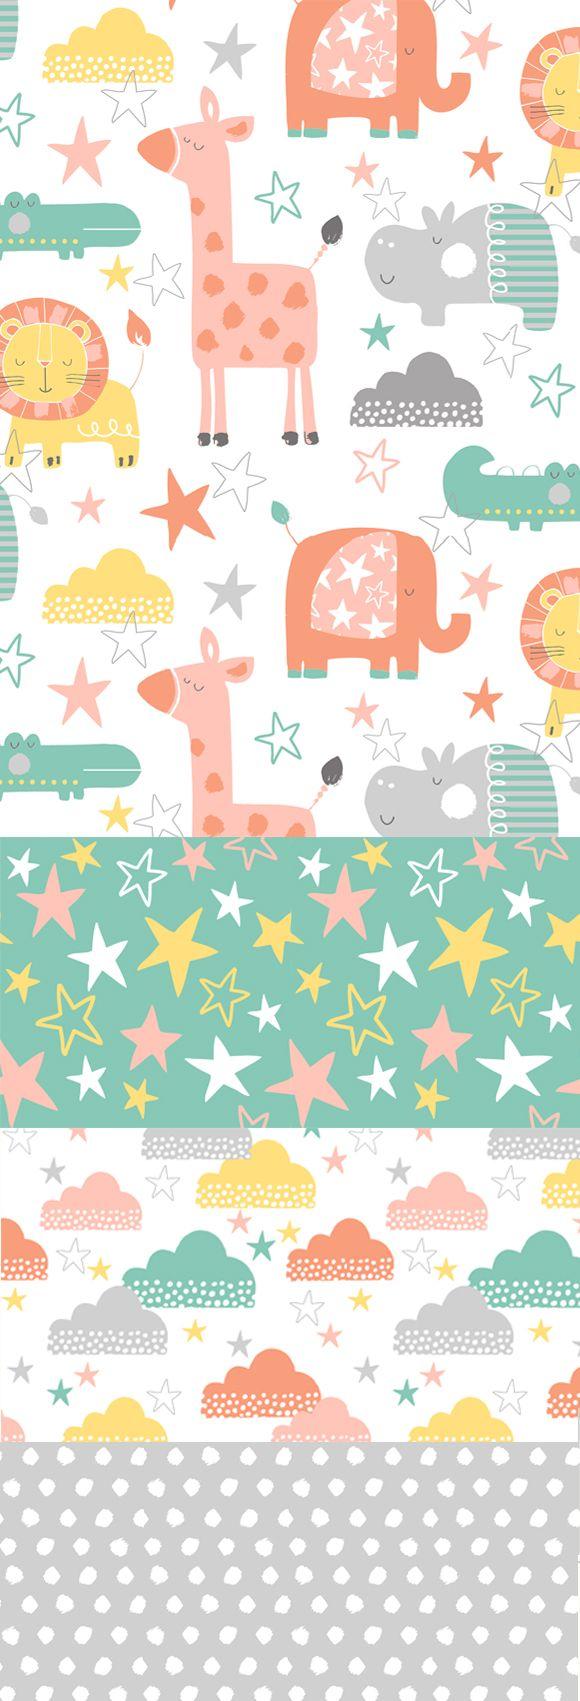 wendy kendall designs – freelance surface pattern designer » jungle stars, pineado por H A B I T A N 2 http://habitanods.blogspot.com.es